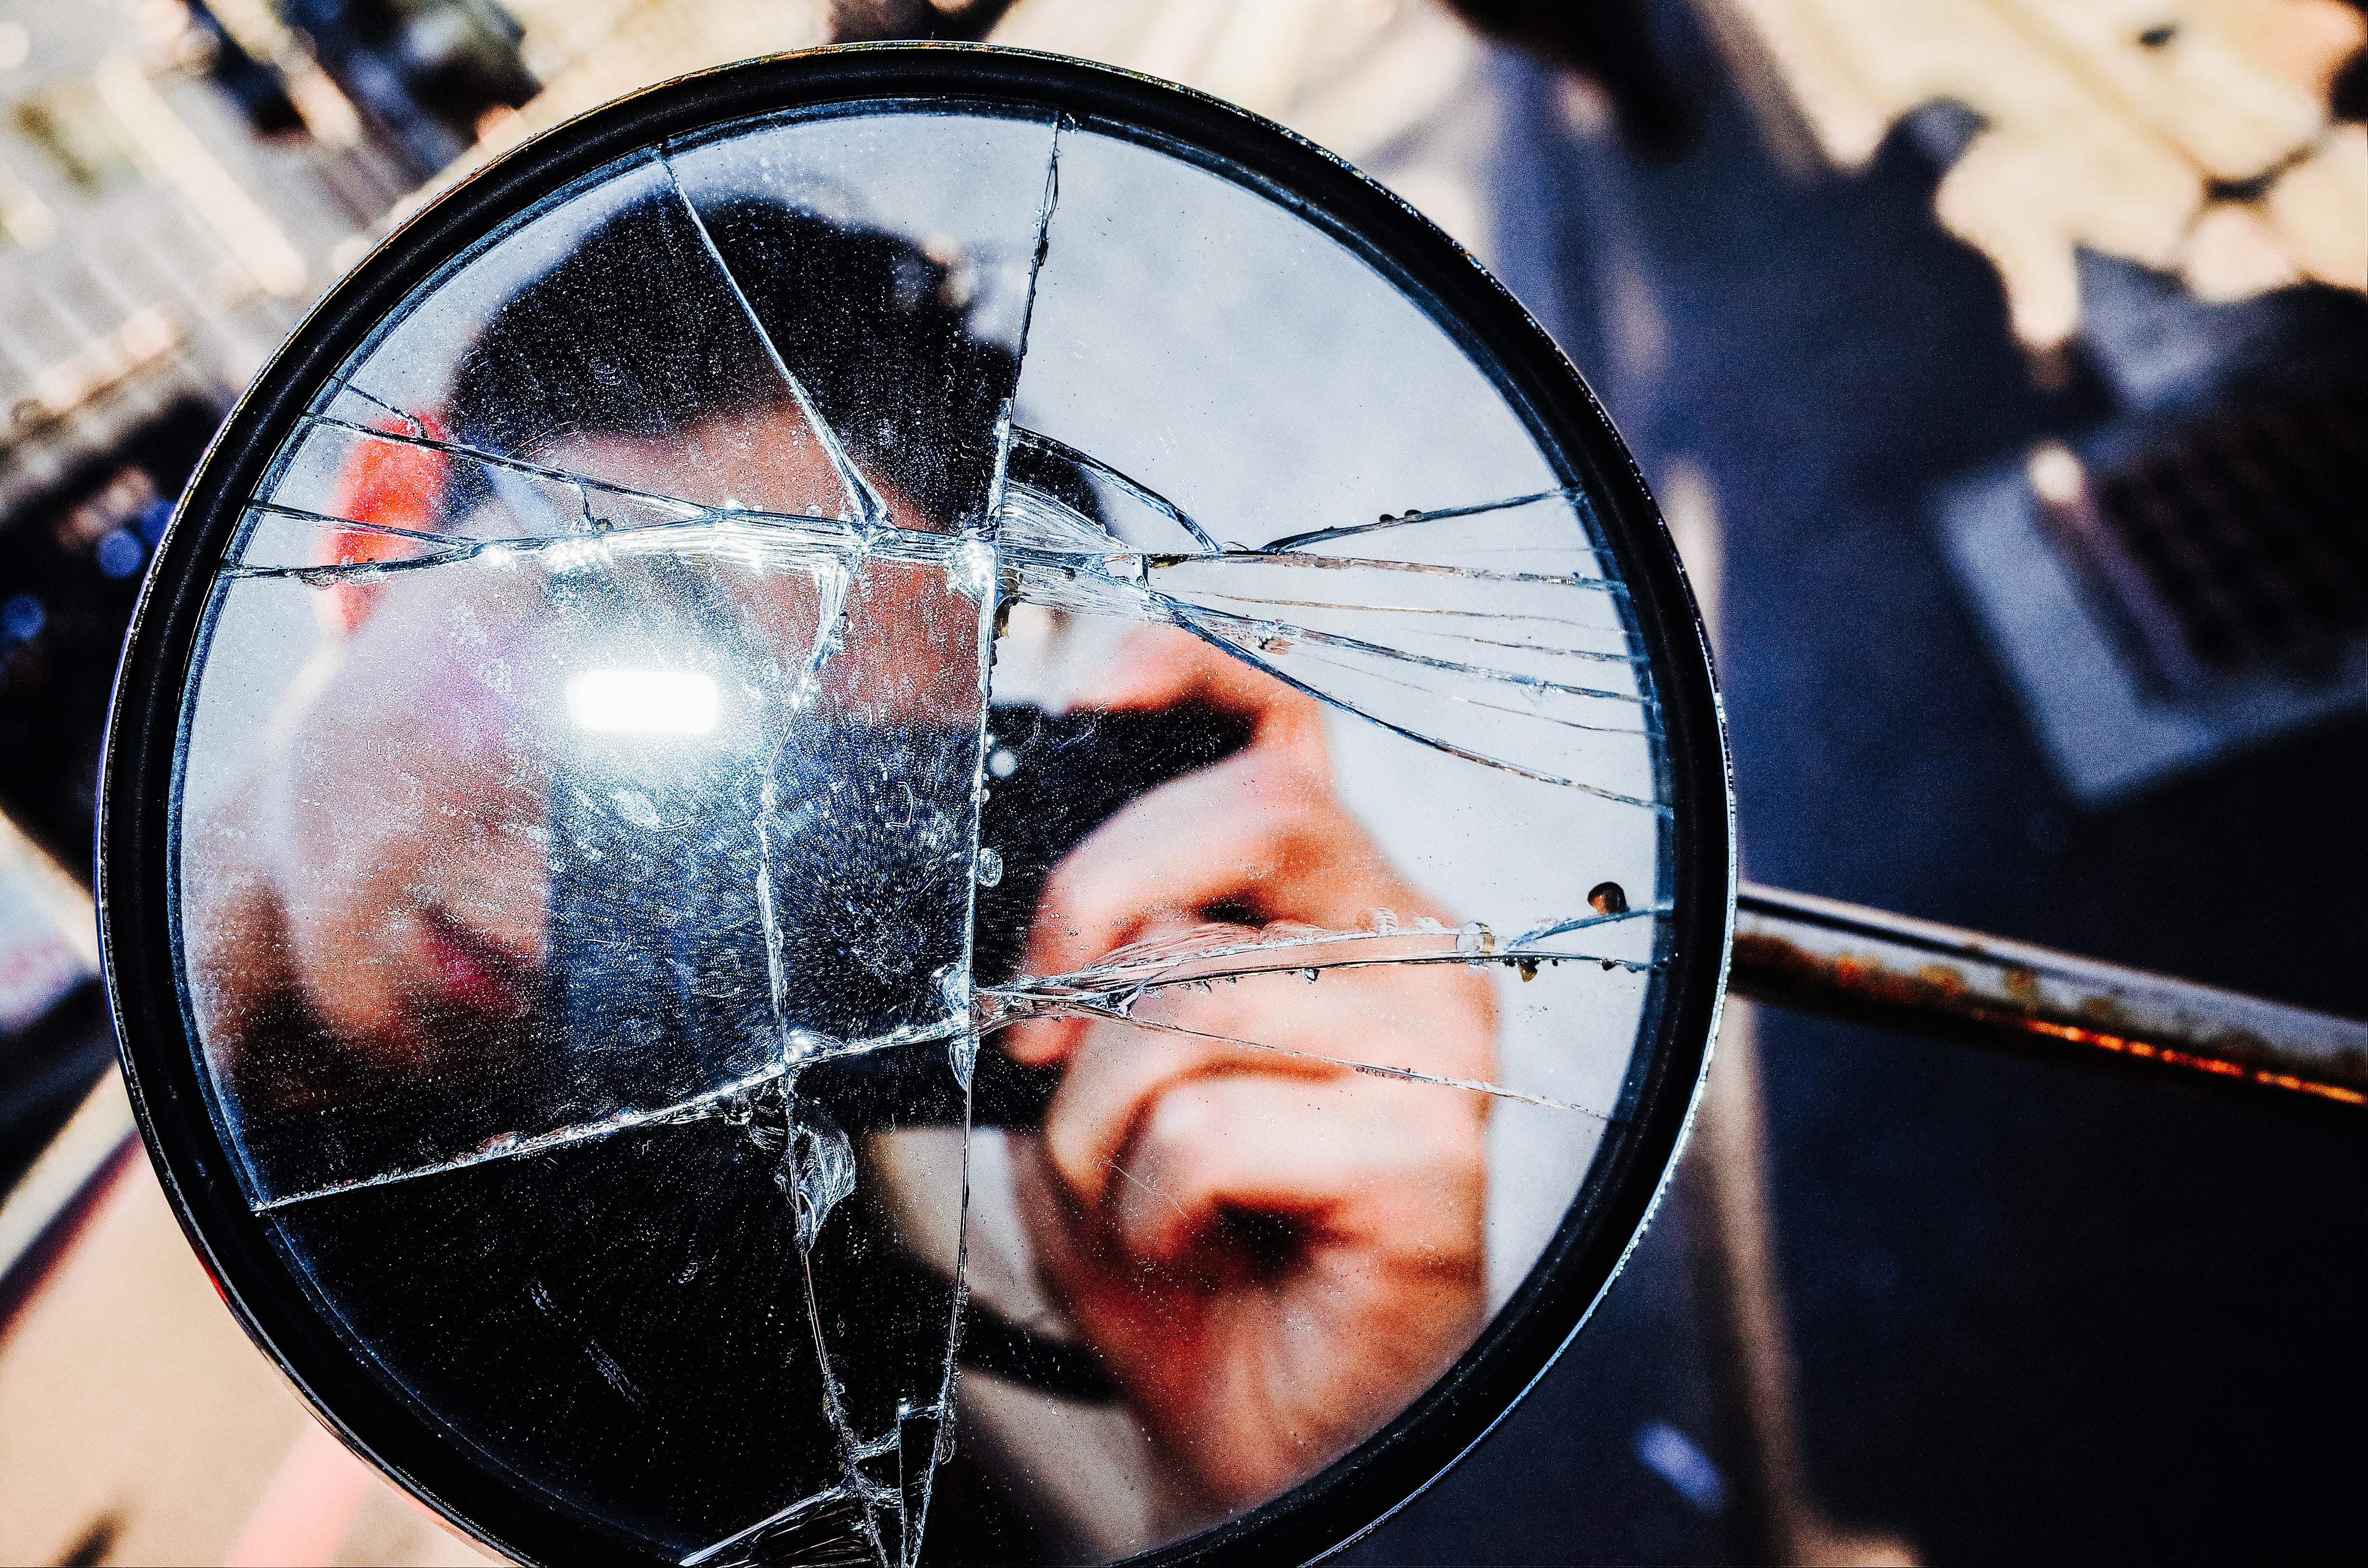 Selfie through broken glass with flash.